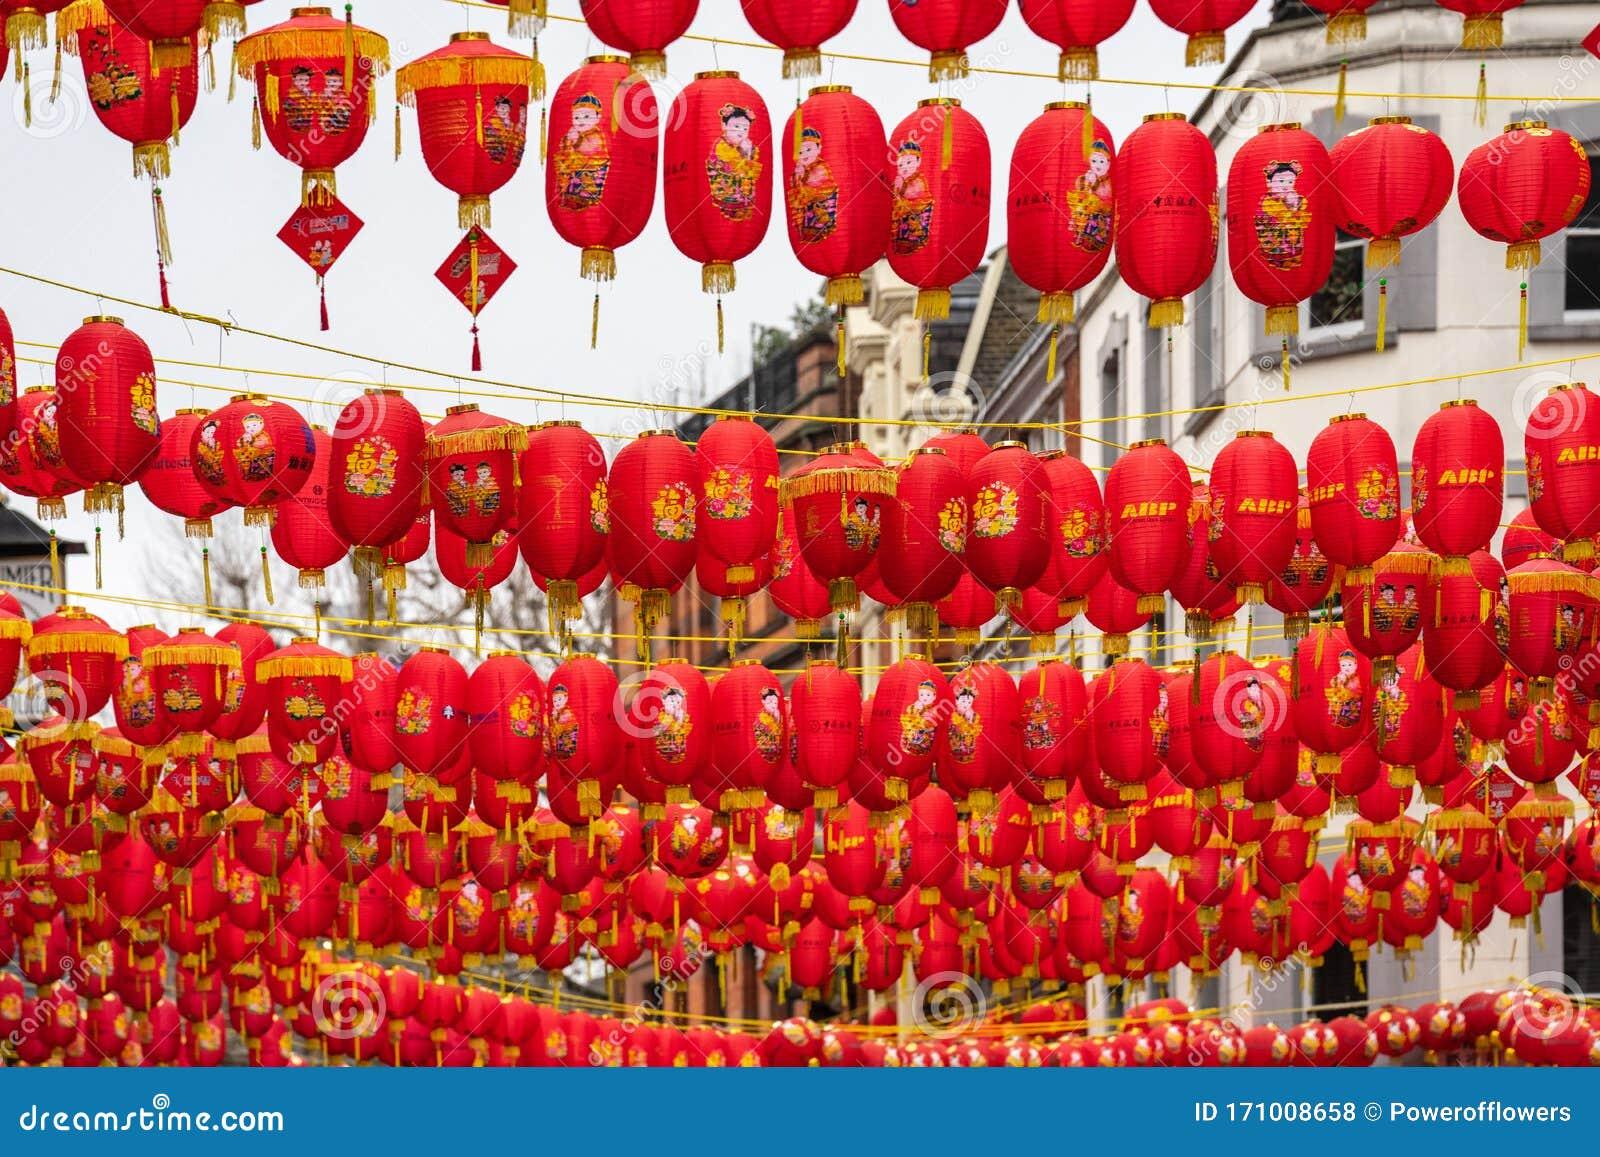 London January 26 2020 Chinese Paper Lanterns London Chinatown Chinese New Year Celebrations Editorial Stock Photo Image Of Chinatown Lamp 171008658